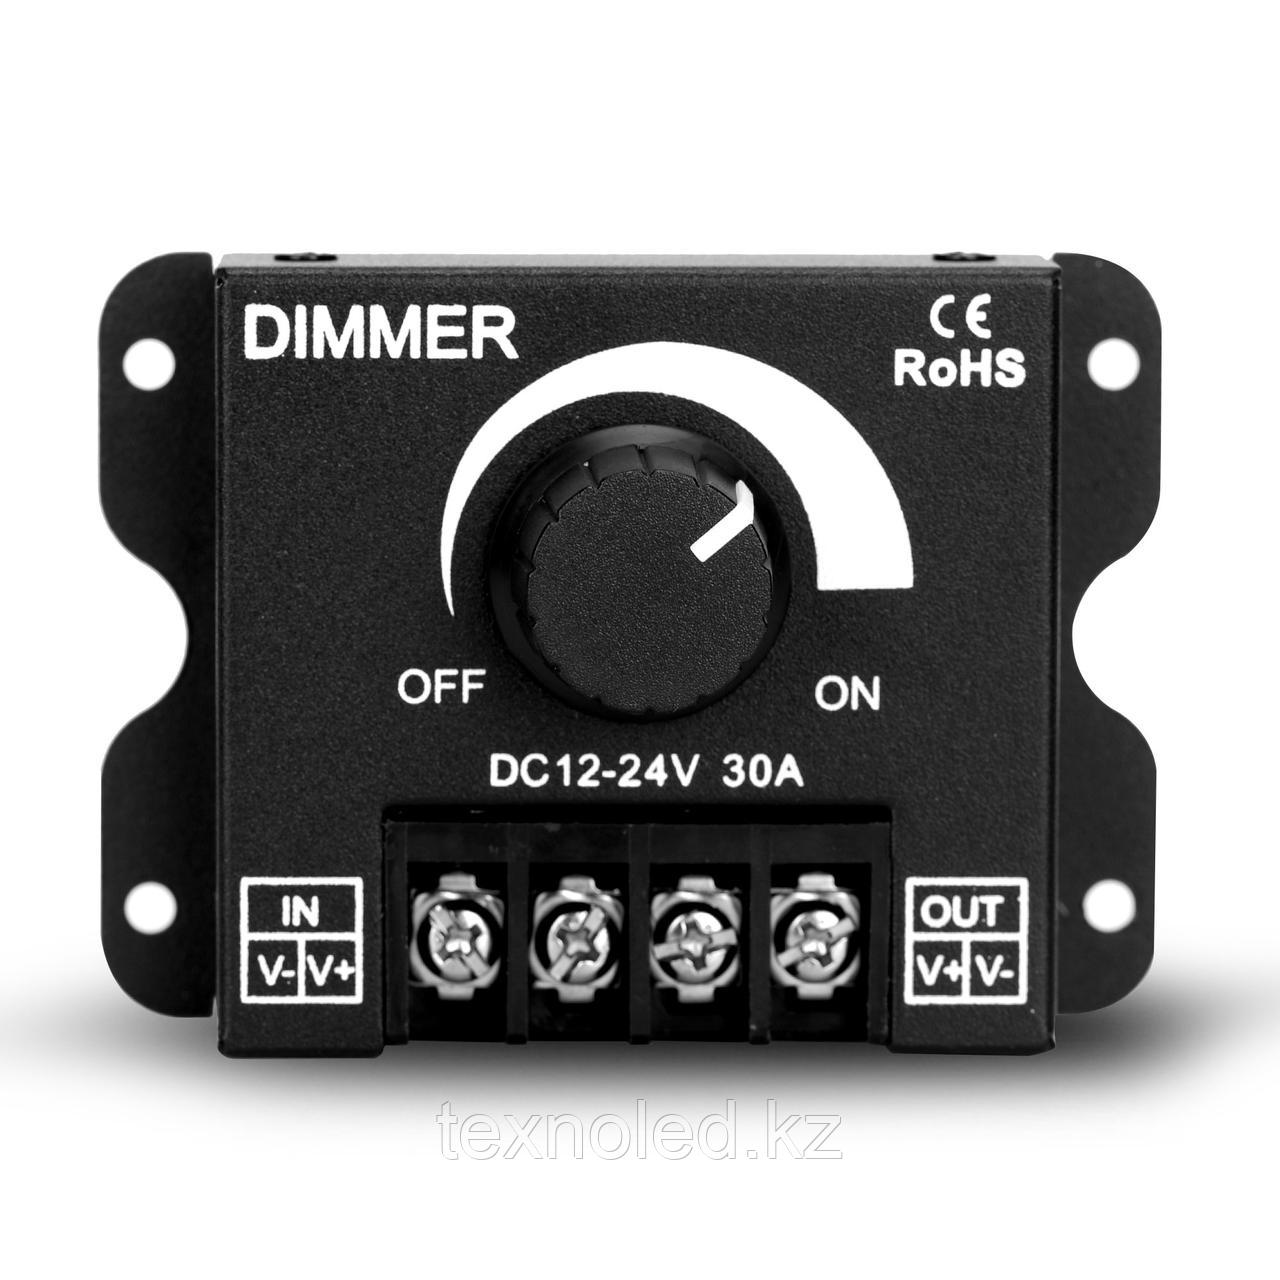 DC 12V-24V PWM LED Lighting Dimming для светодиодной ленты Dimmer 30 A